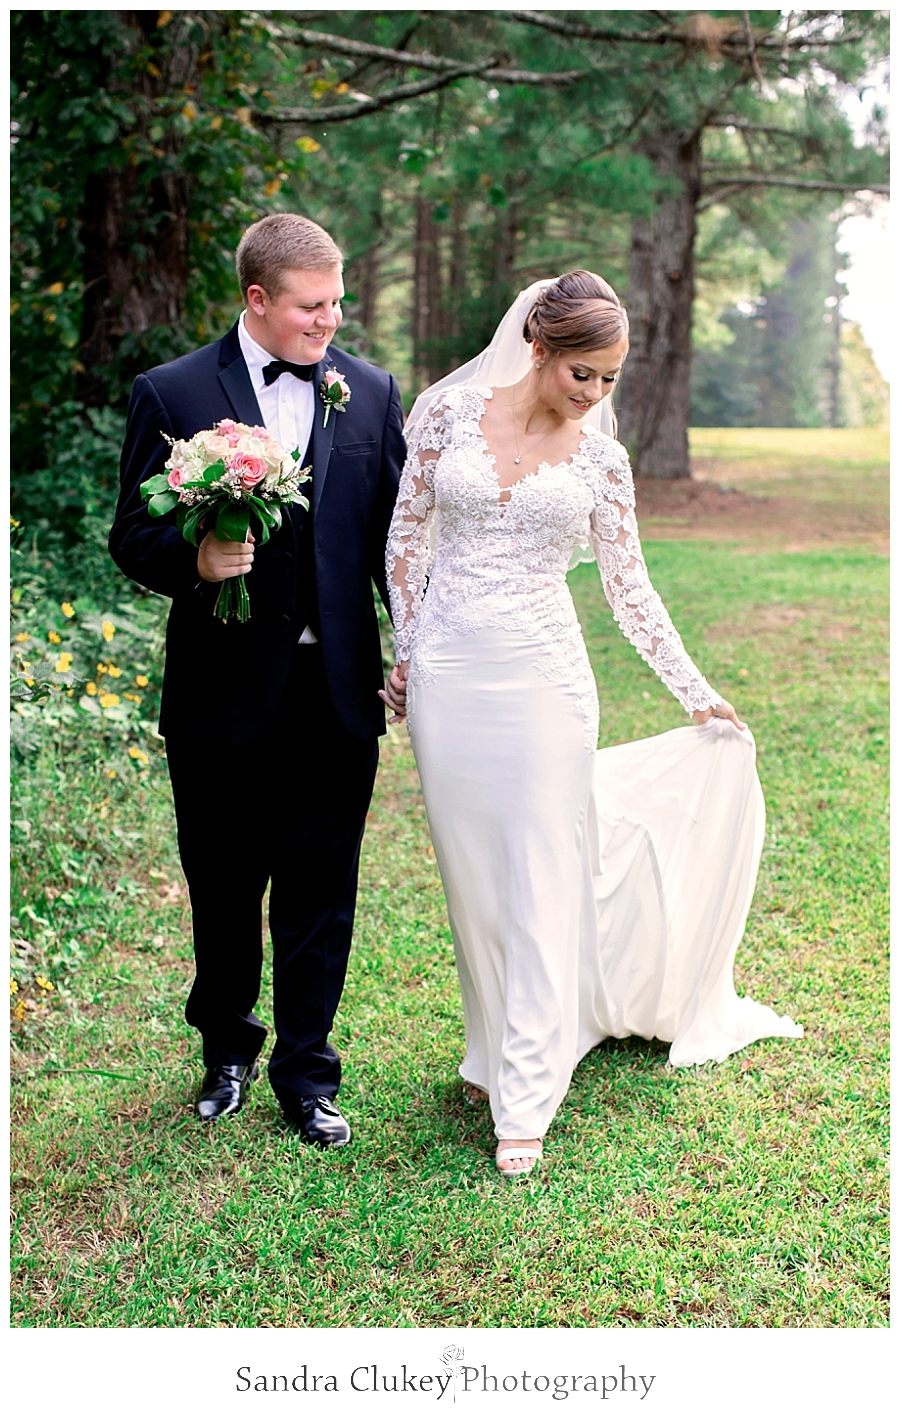 Bride and groom walking in Fletcher Park, Cleveland TN.  Copyright Sandra Clukey Photography, LLC  https://www.sandraclukeyphotography.com/